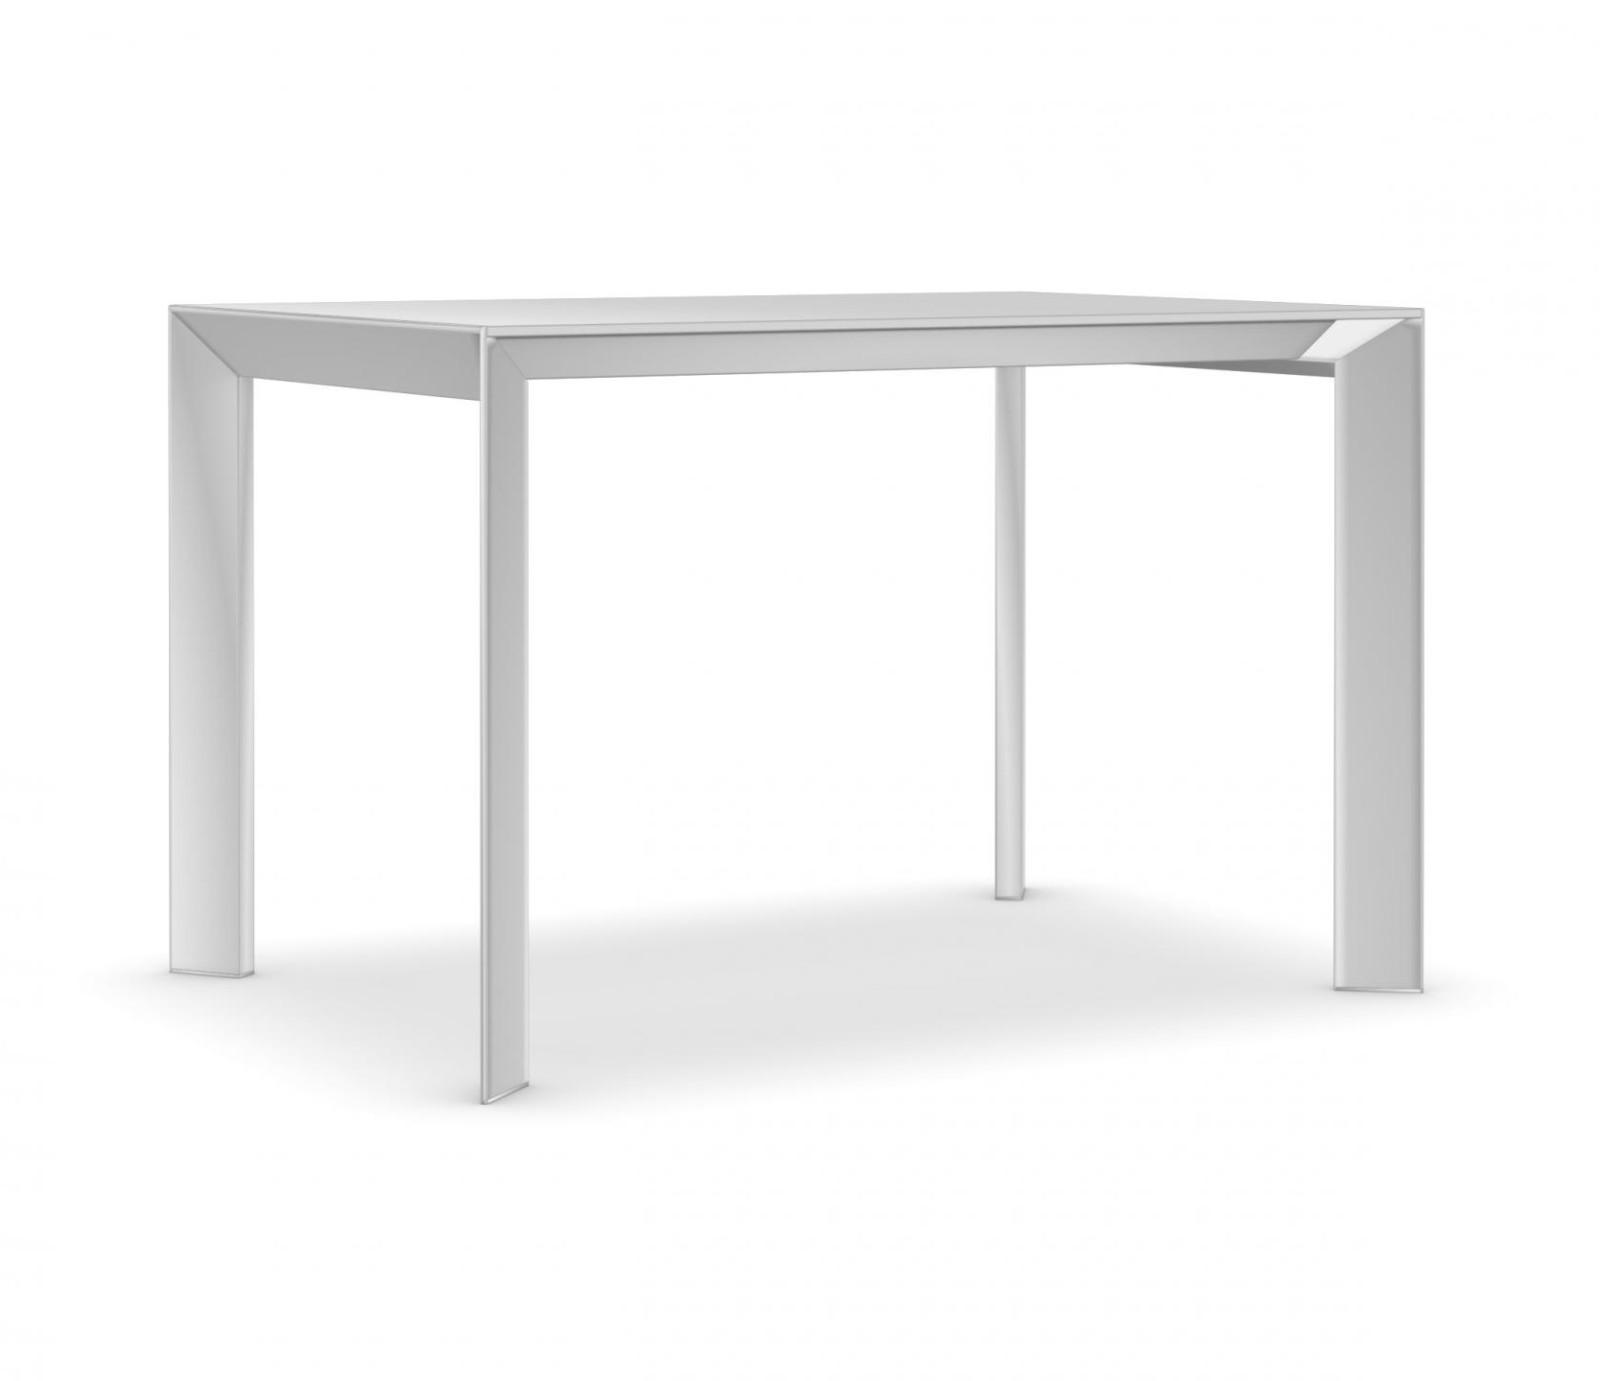 Nori glass Fixed - Depth 80 cm 209 cm, Anodised Aluminium, Gloss glass: Extra White